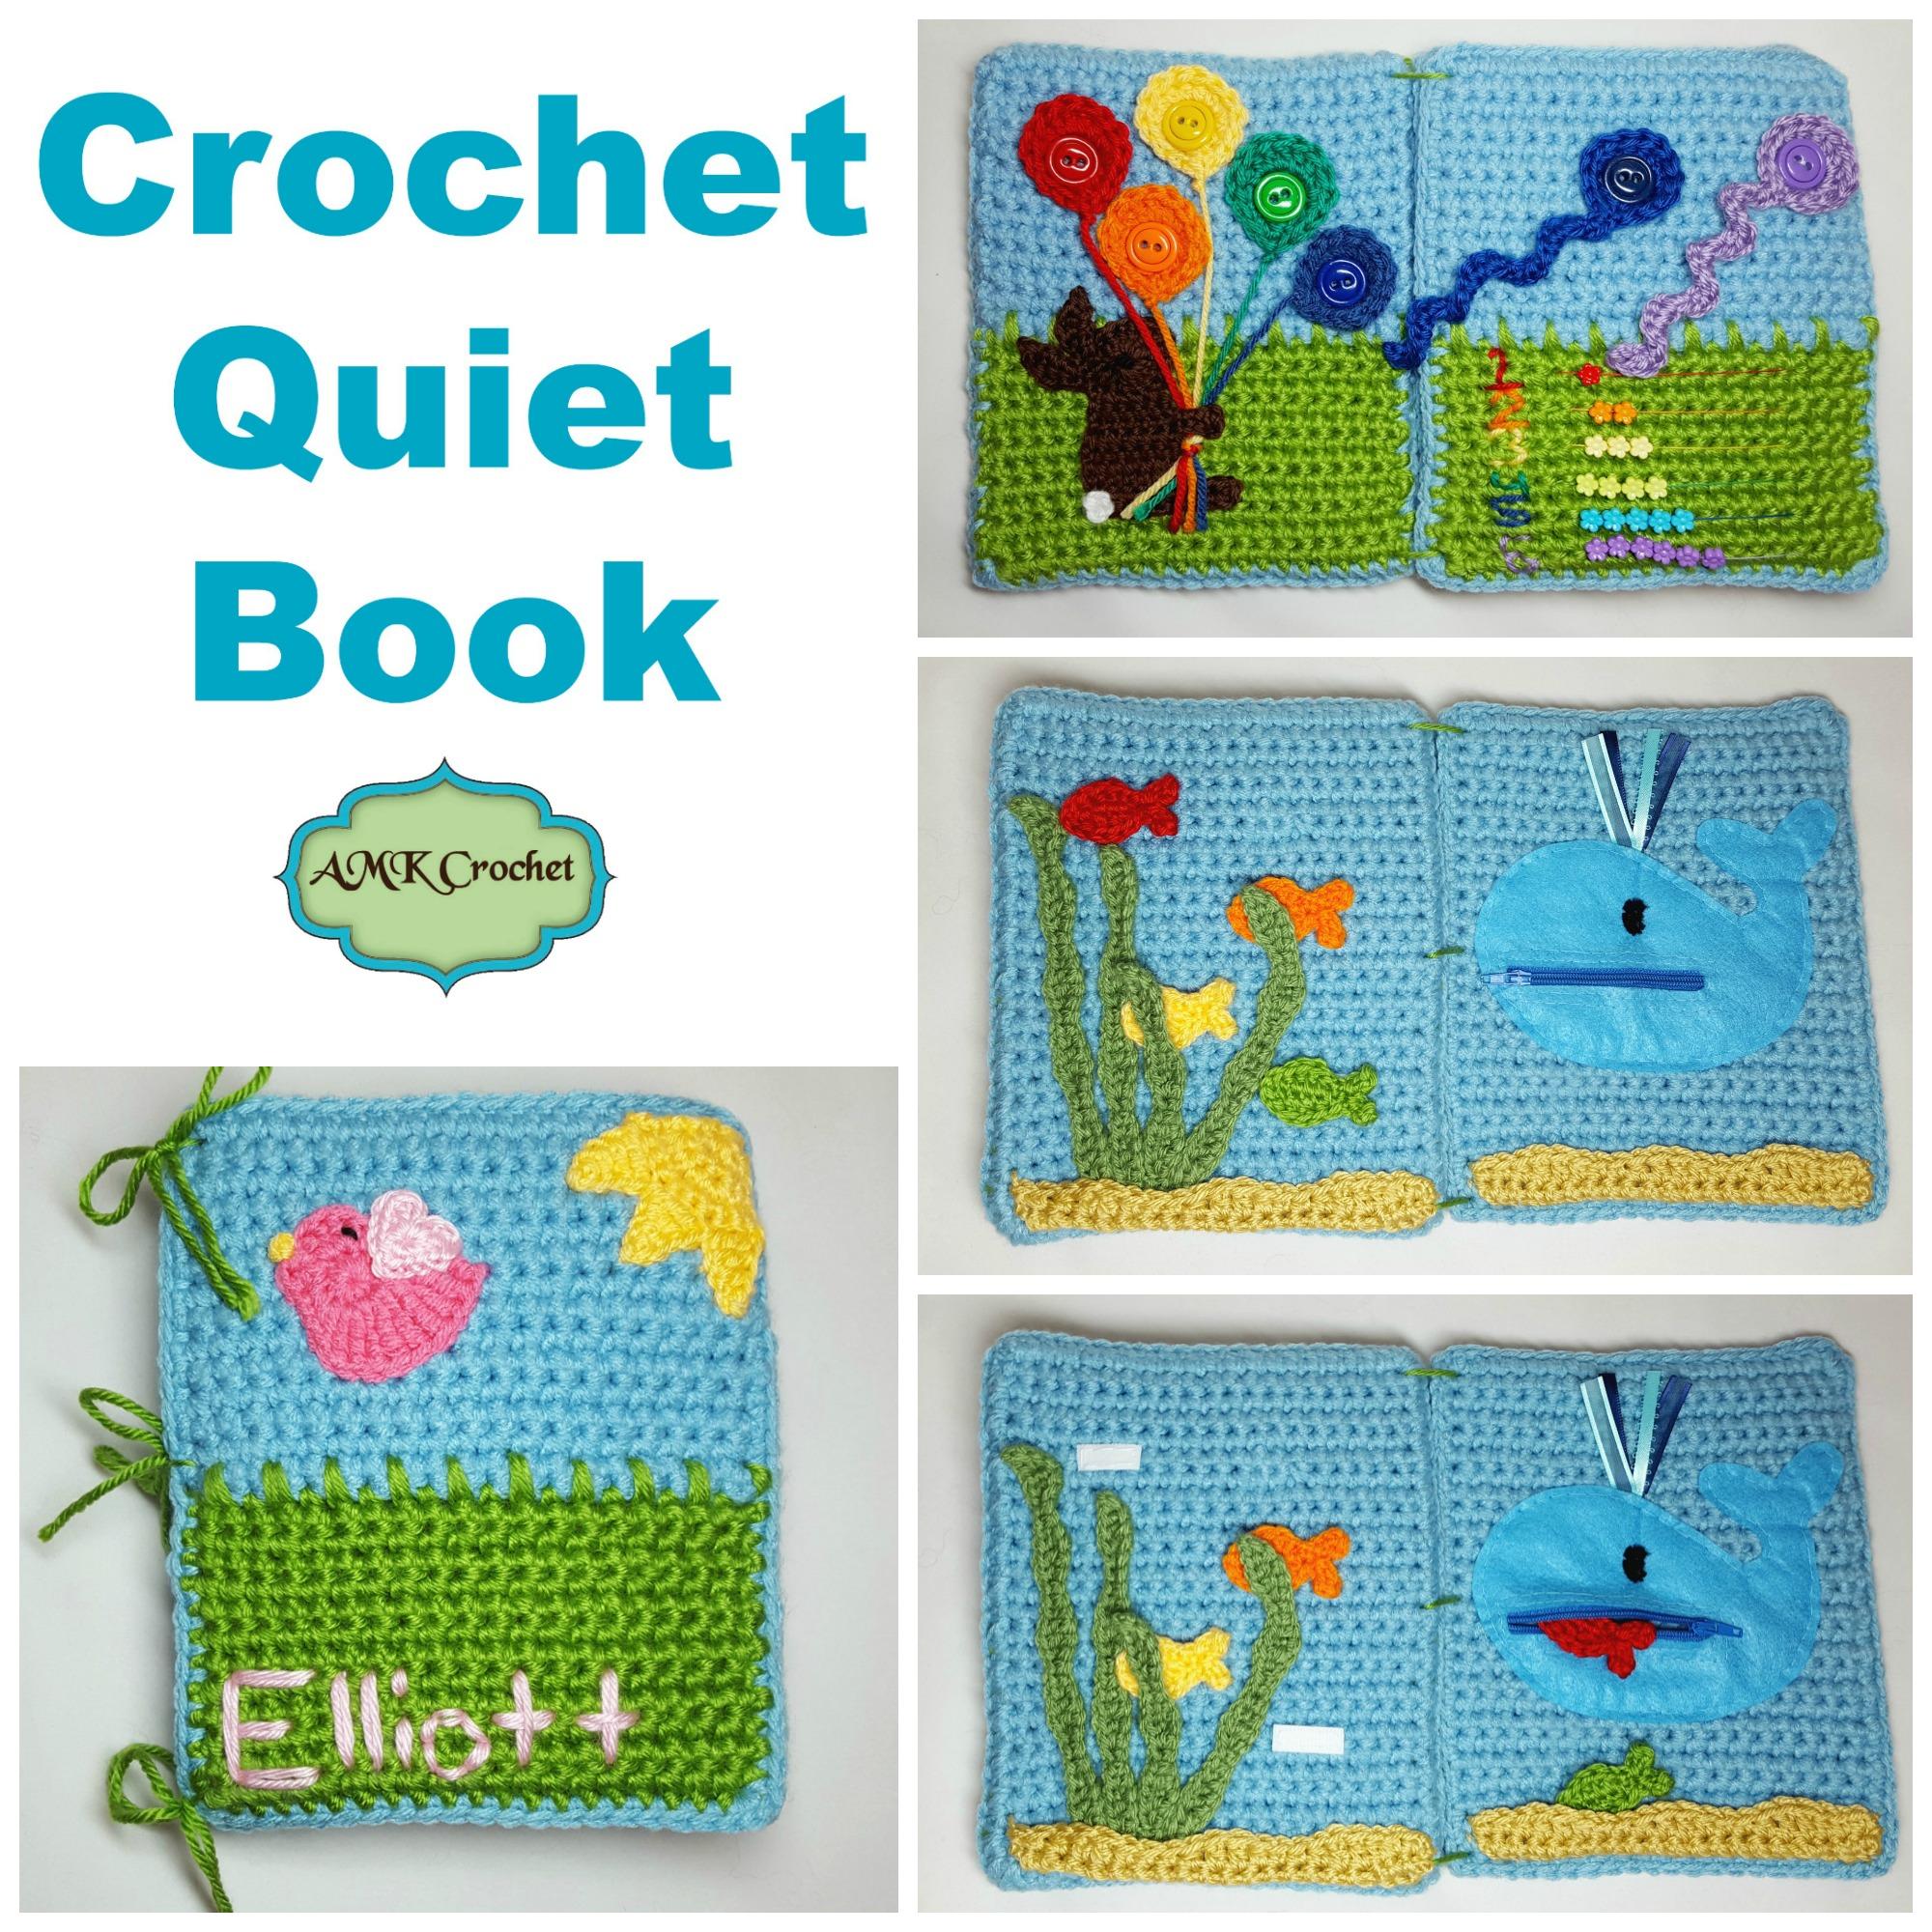 Crochet Quiet Book : Crochet Tips, Tricks, Photo Tutorials, and Crochet Patterns